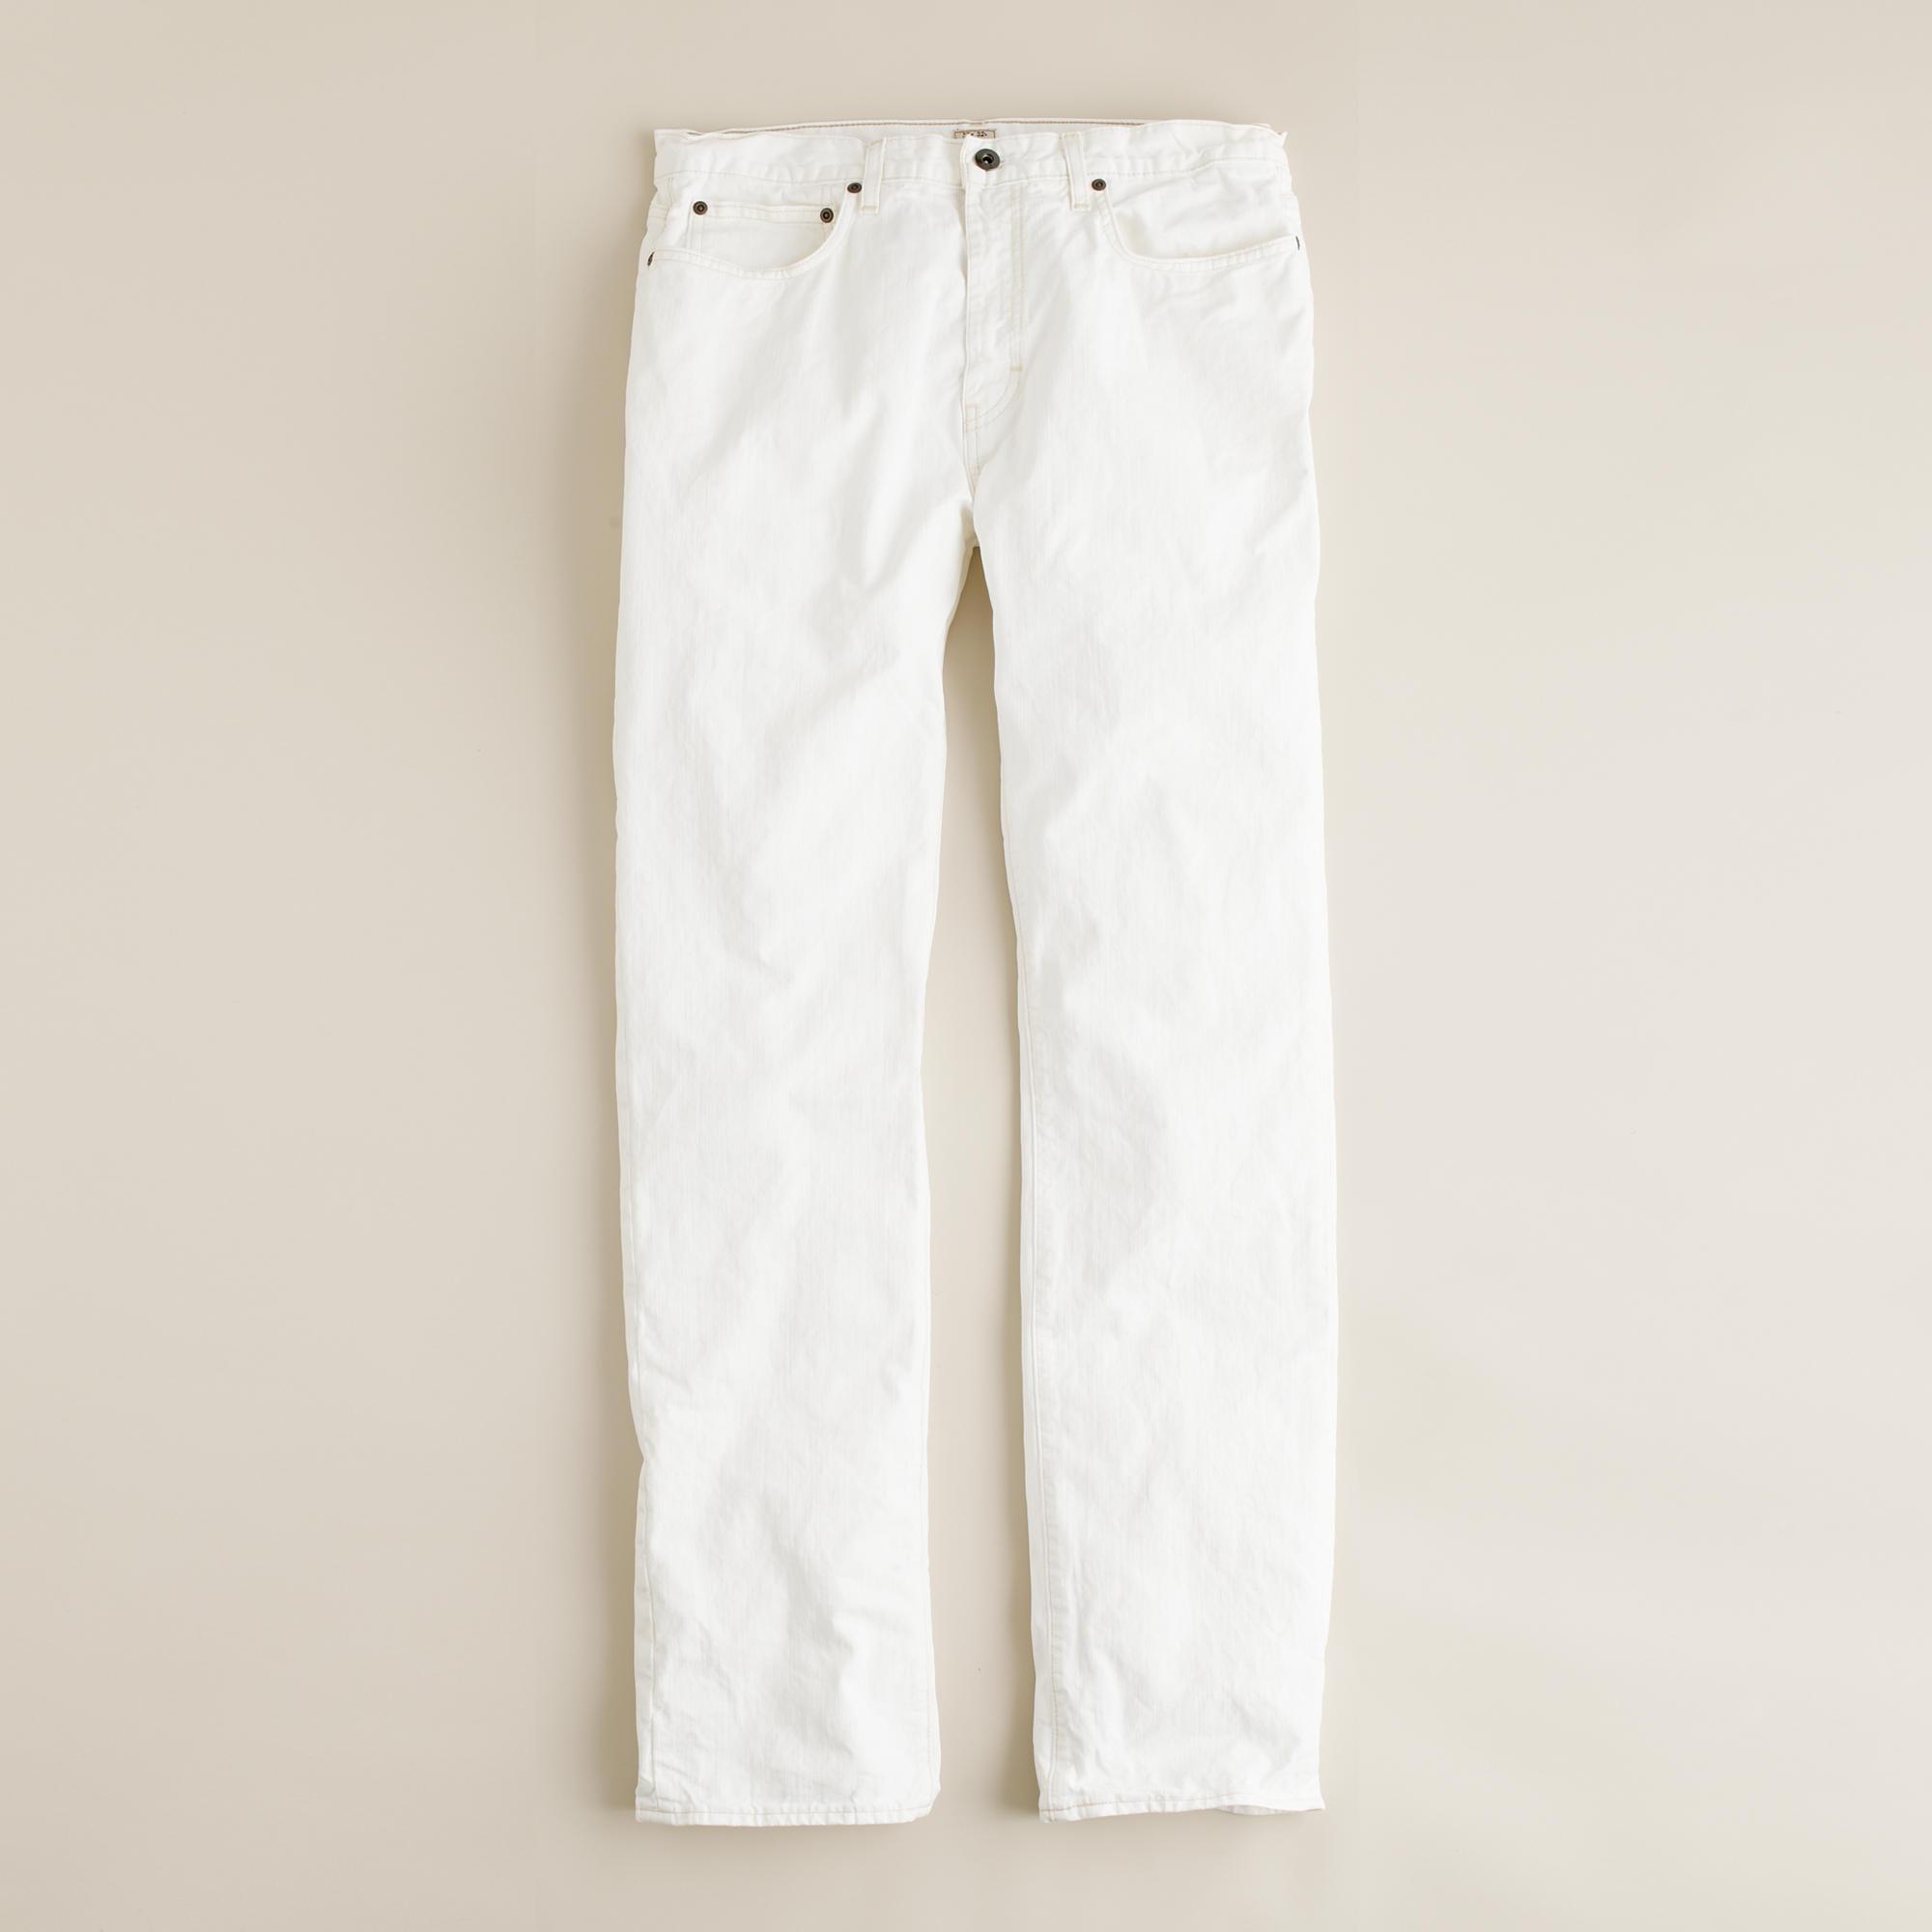 Slim-straight jean in antique white : | J.Crew